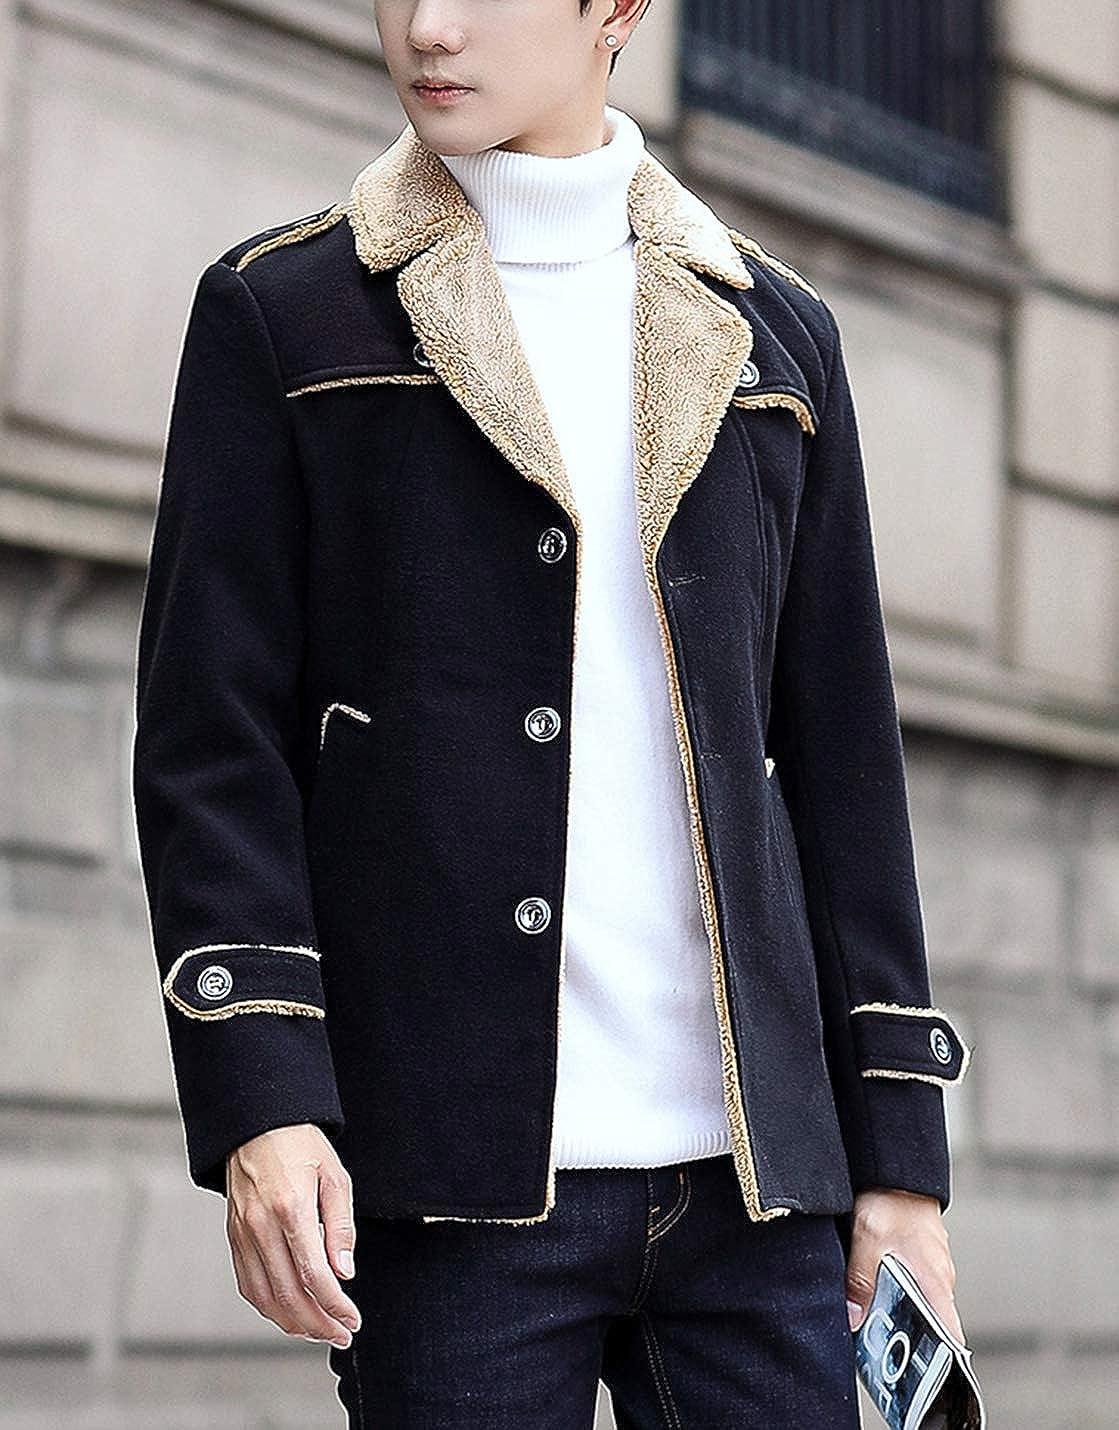 Gihuo Mens Winter Woolen Fleece Lined Notched Lapel Single Breasted Jacket